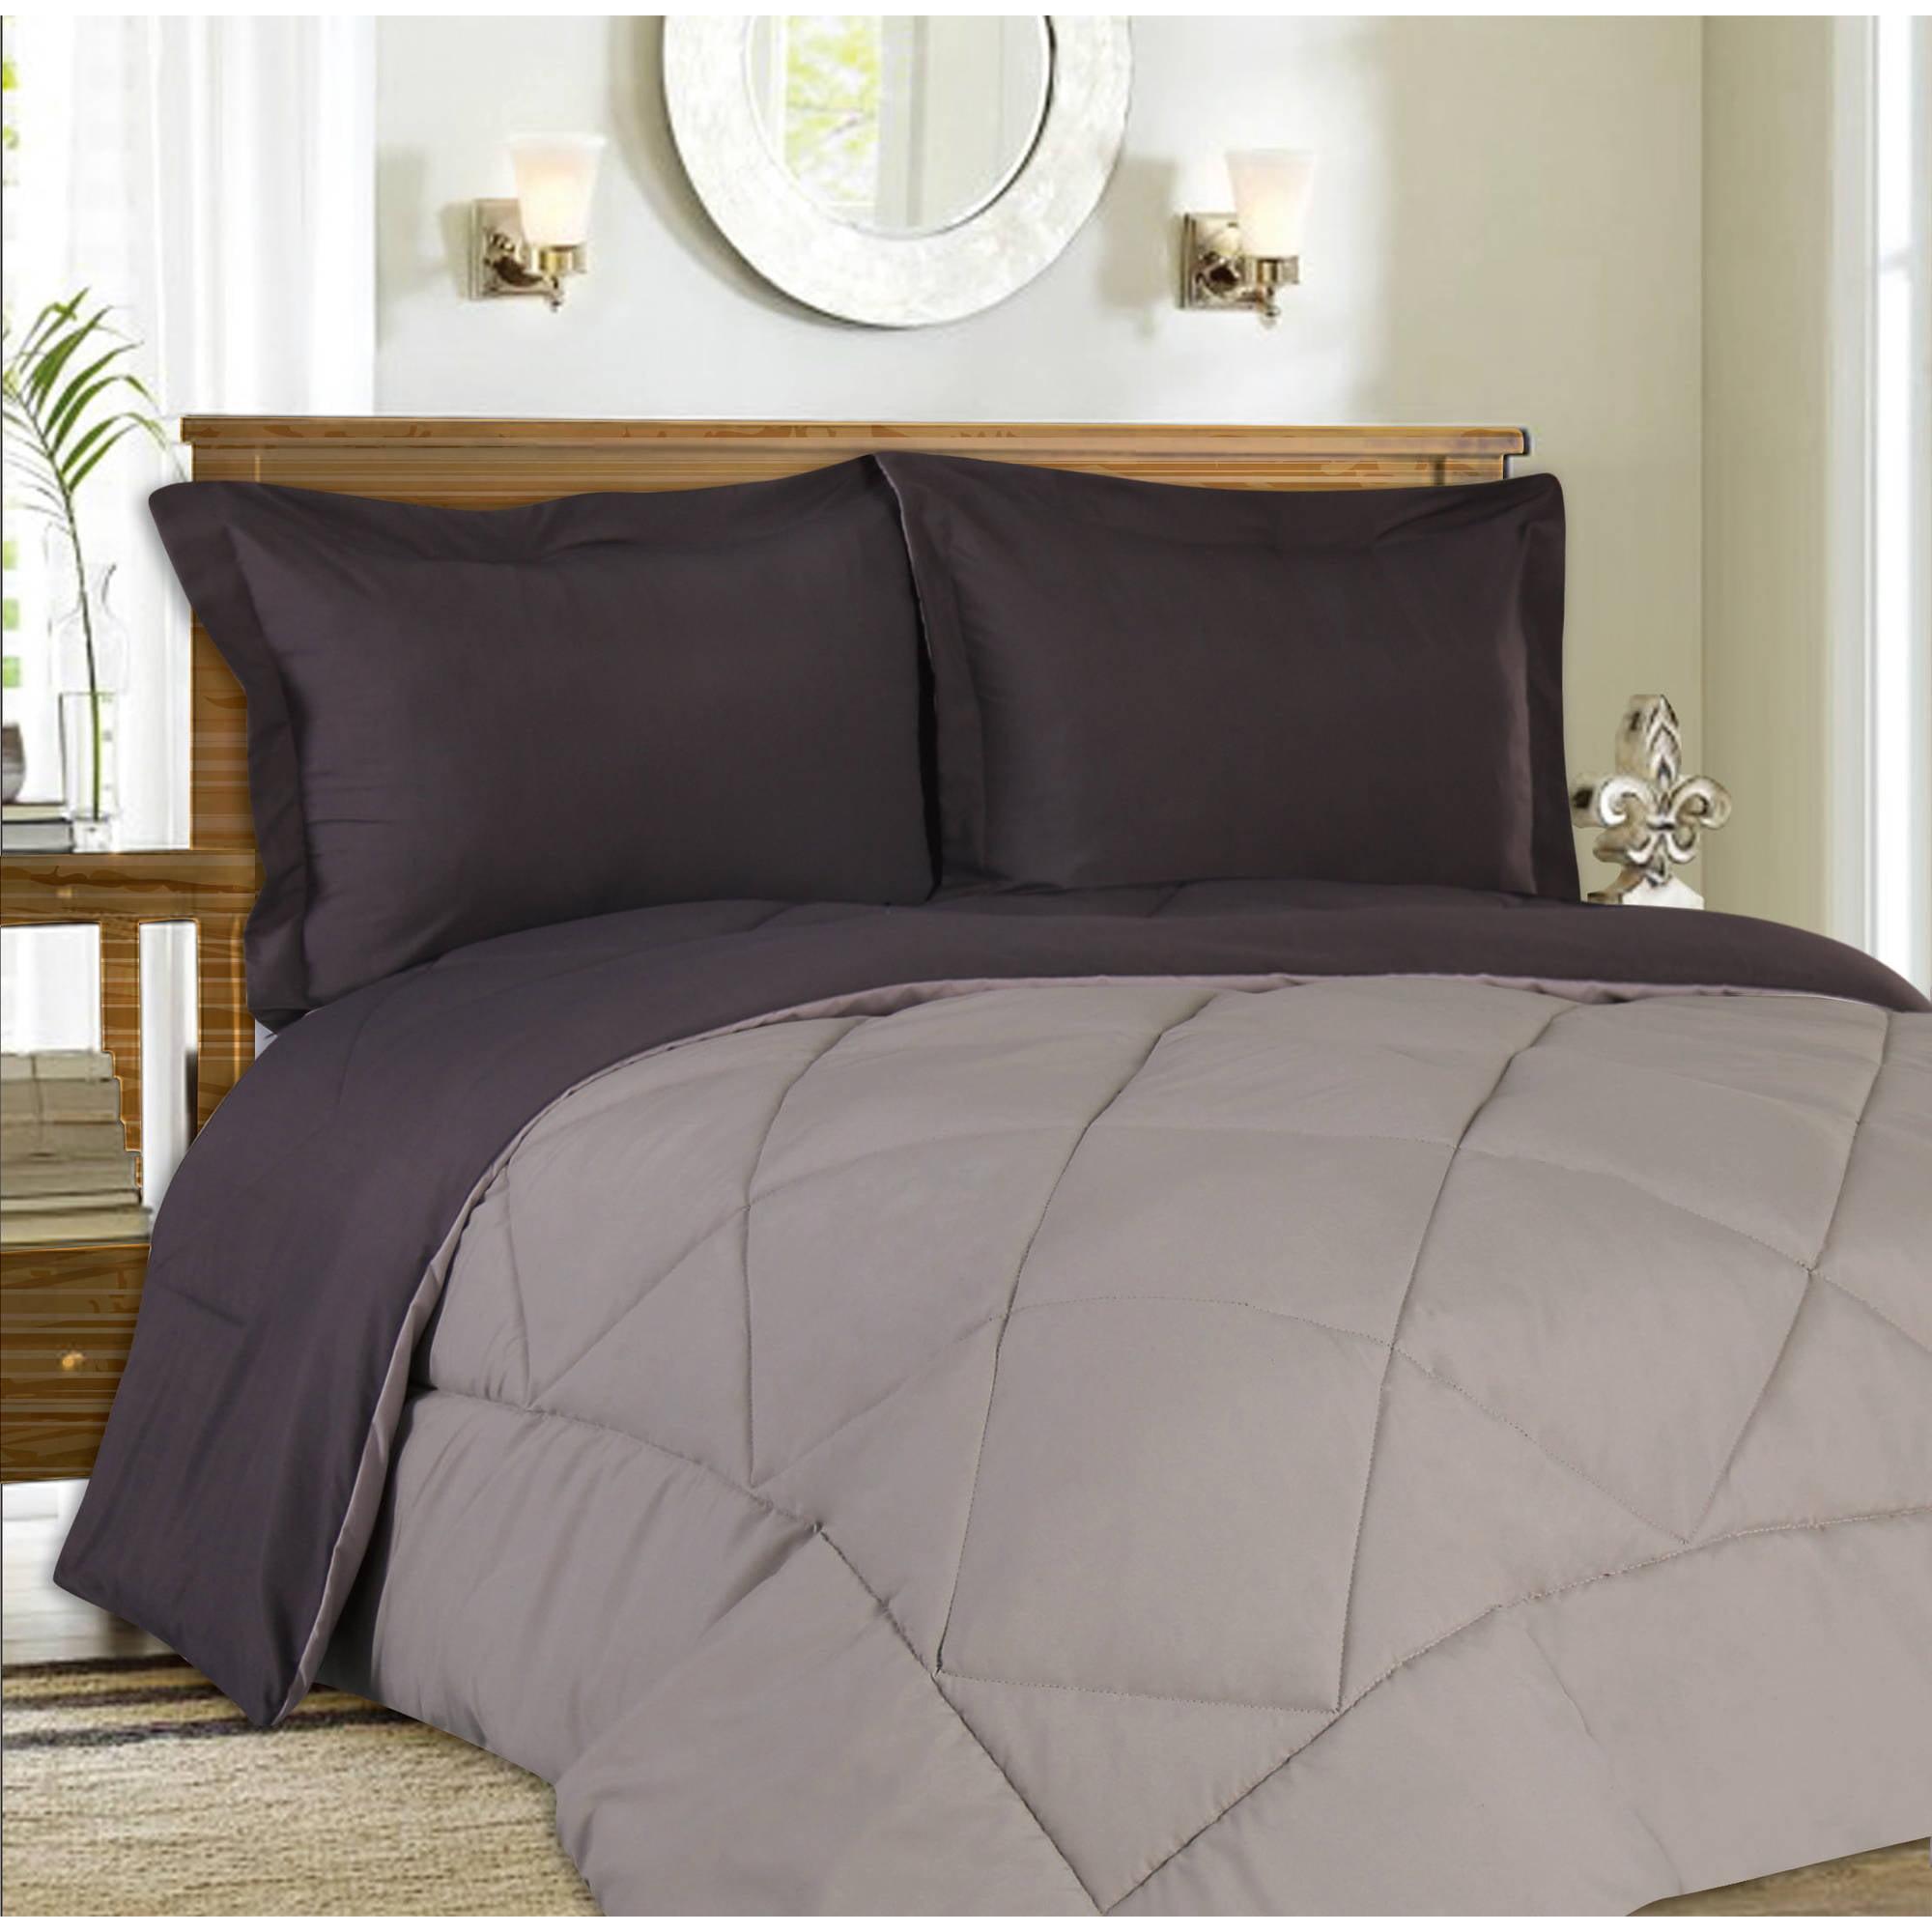 Down Alternative Comforter Reversible 3-Piece Bedding Set, 90 GSM